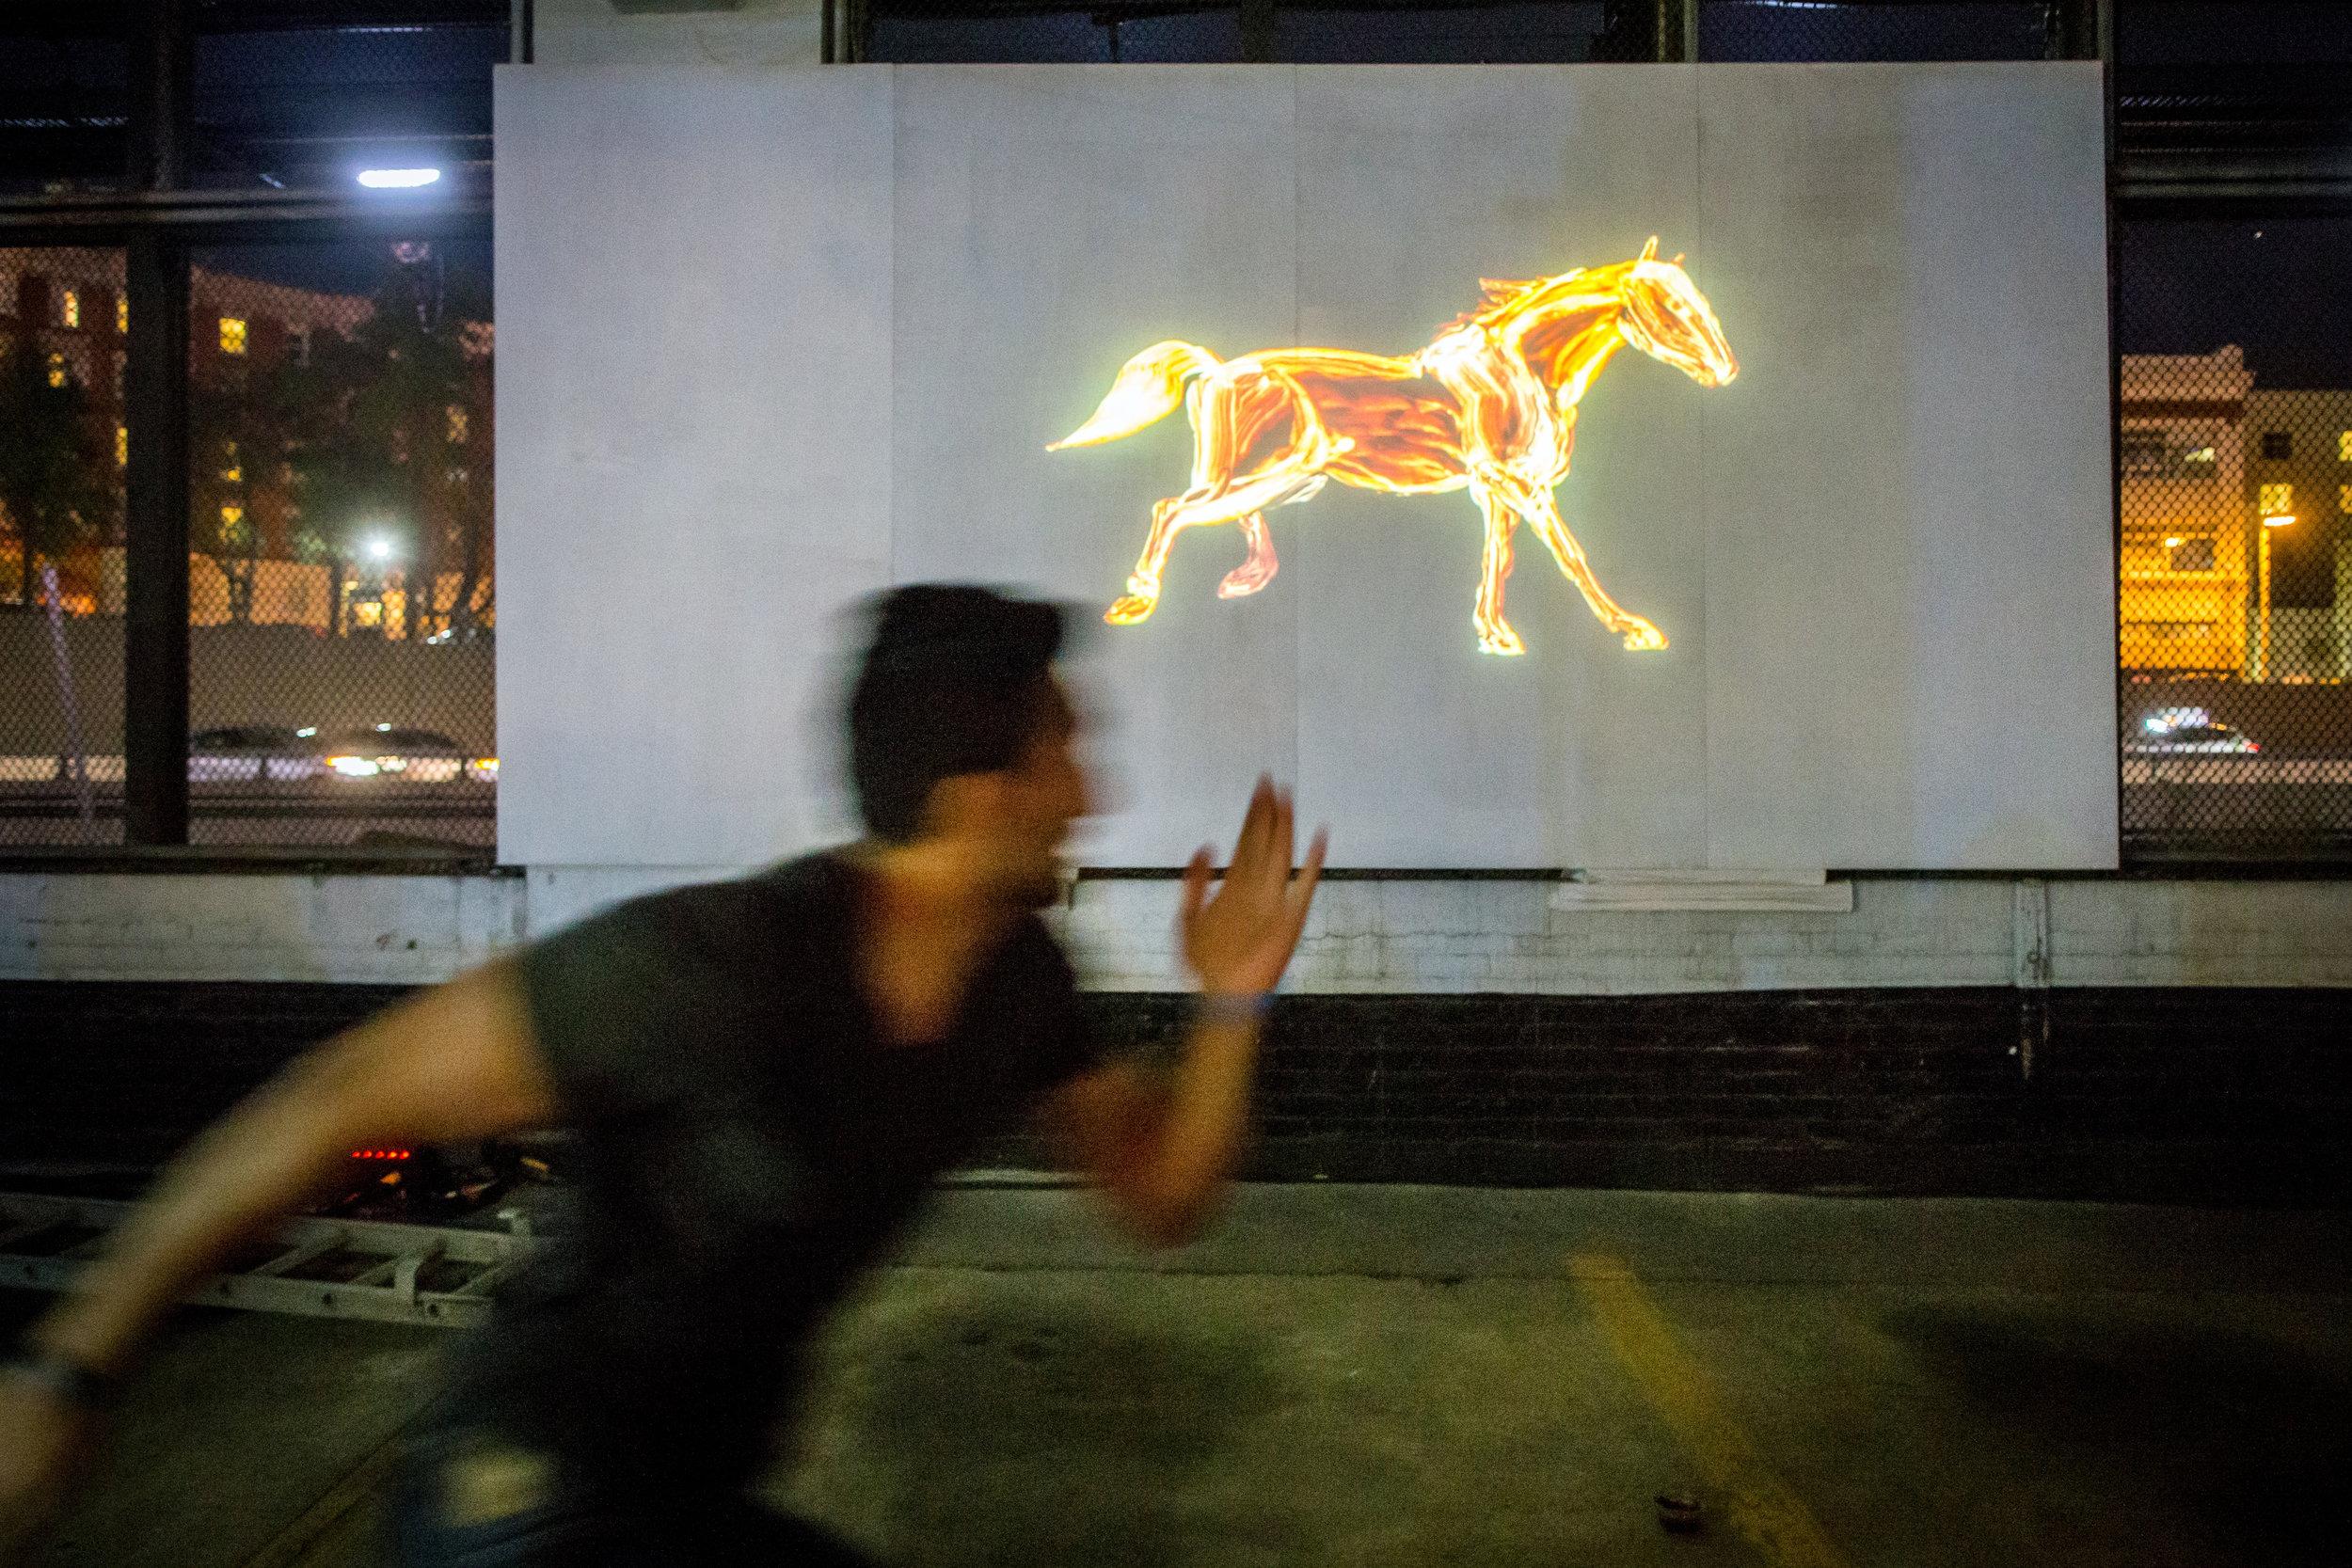 Gallop_Claire Eder_Illuminus 2015_Photo by Aram Boghosian_1.jpg